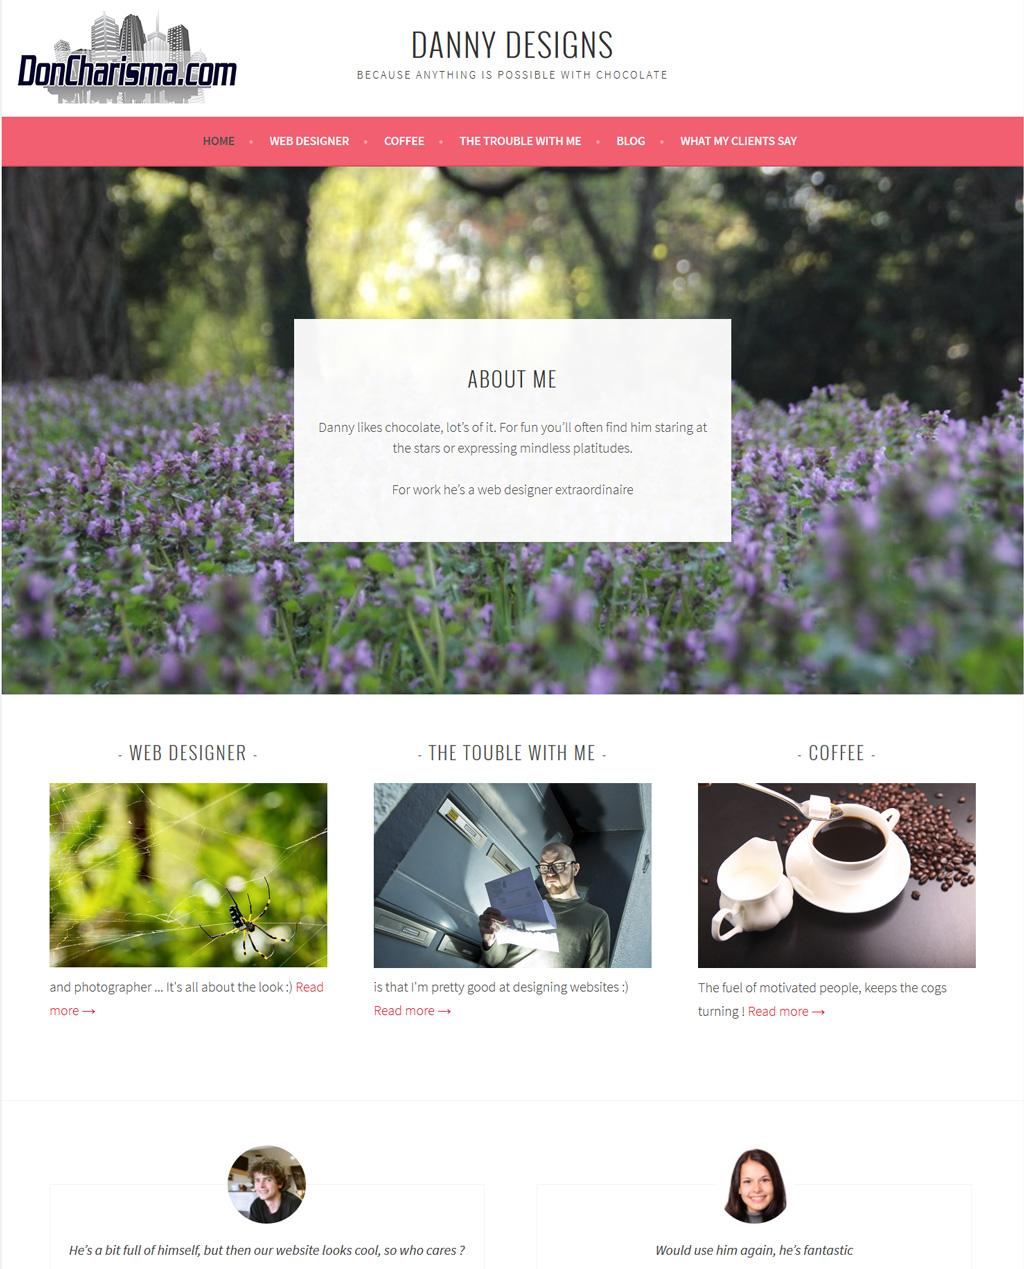 dannydesigns-front-page-doncharisma-logo-1024x